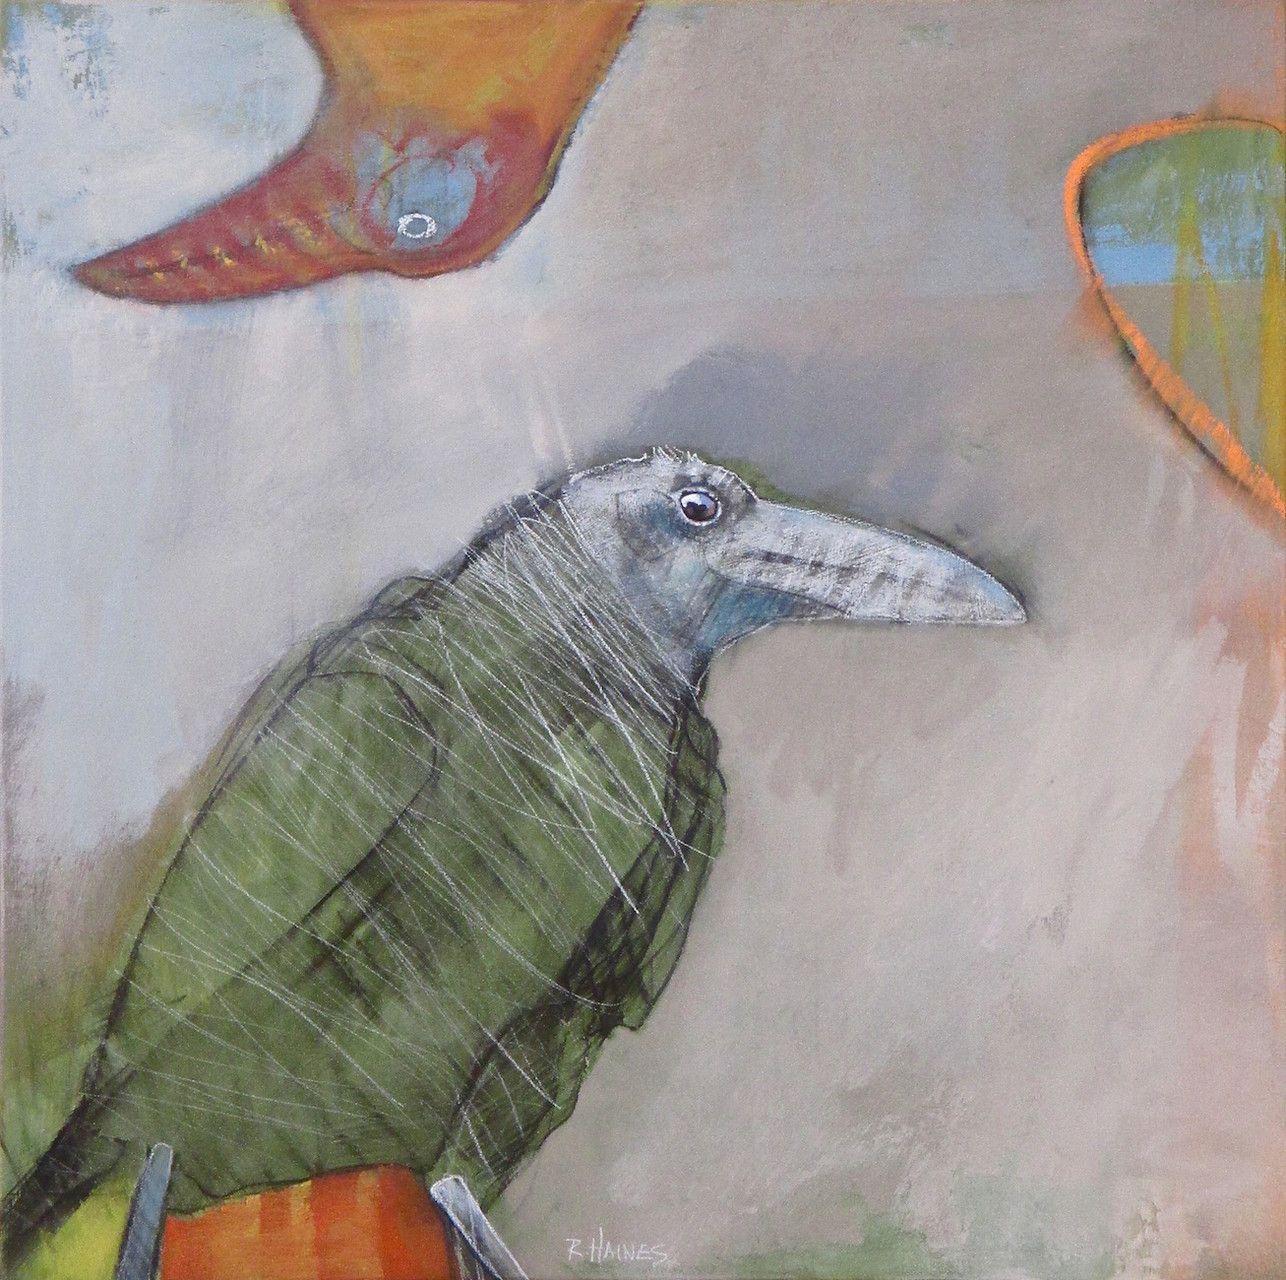 GALLERY 2 - Rebecca Haines Fine Art